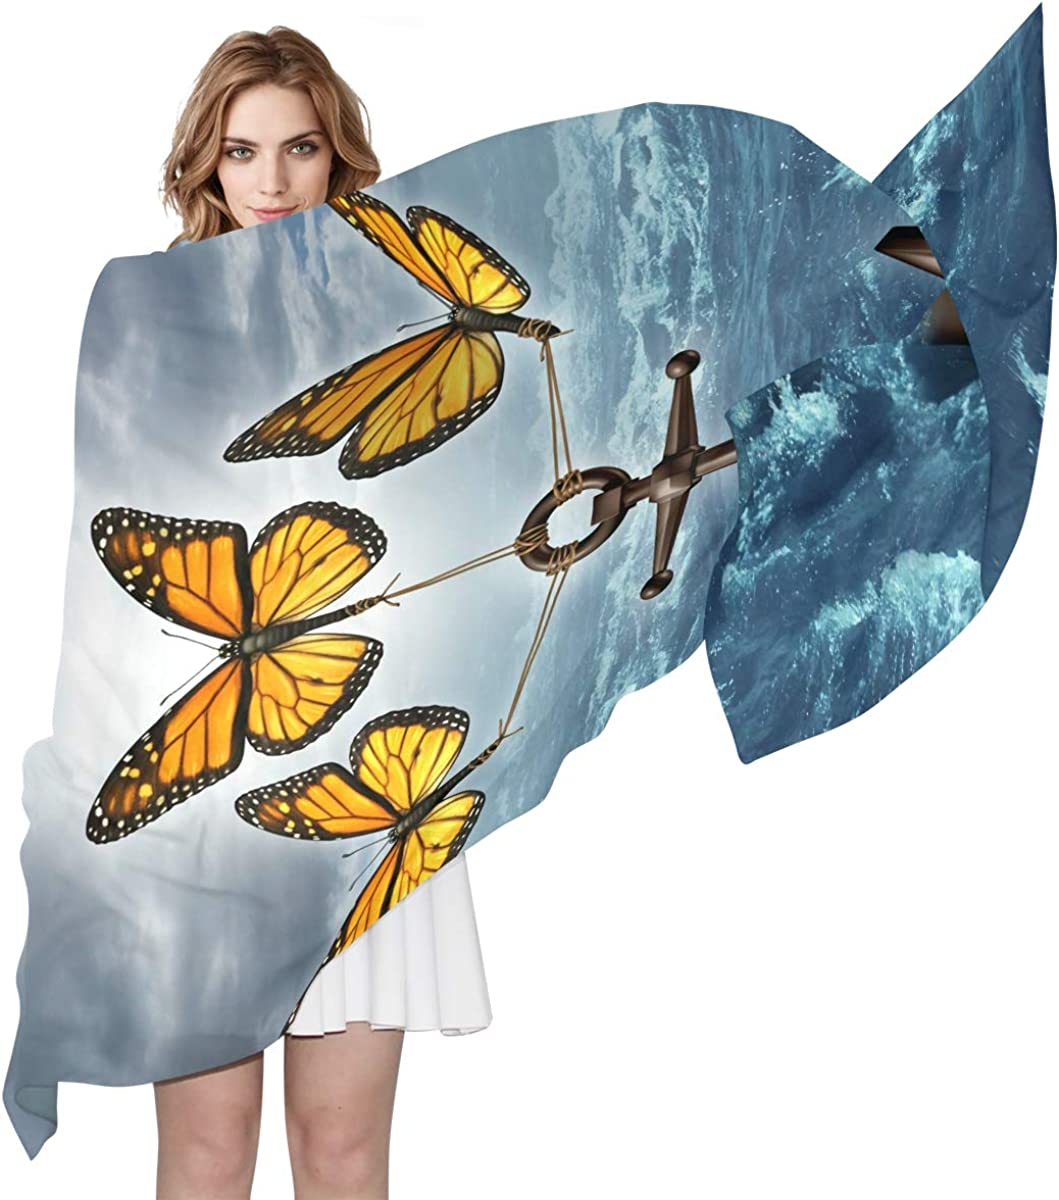 XLING Fashion Scarf Ocean Sea Anchor Butterfly Long Lightweight Sunscreen Scarf Shawl Wrap Muffler Neckerchief for Women Men